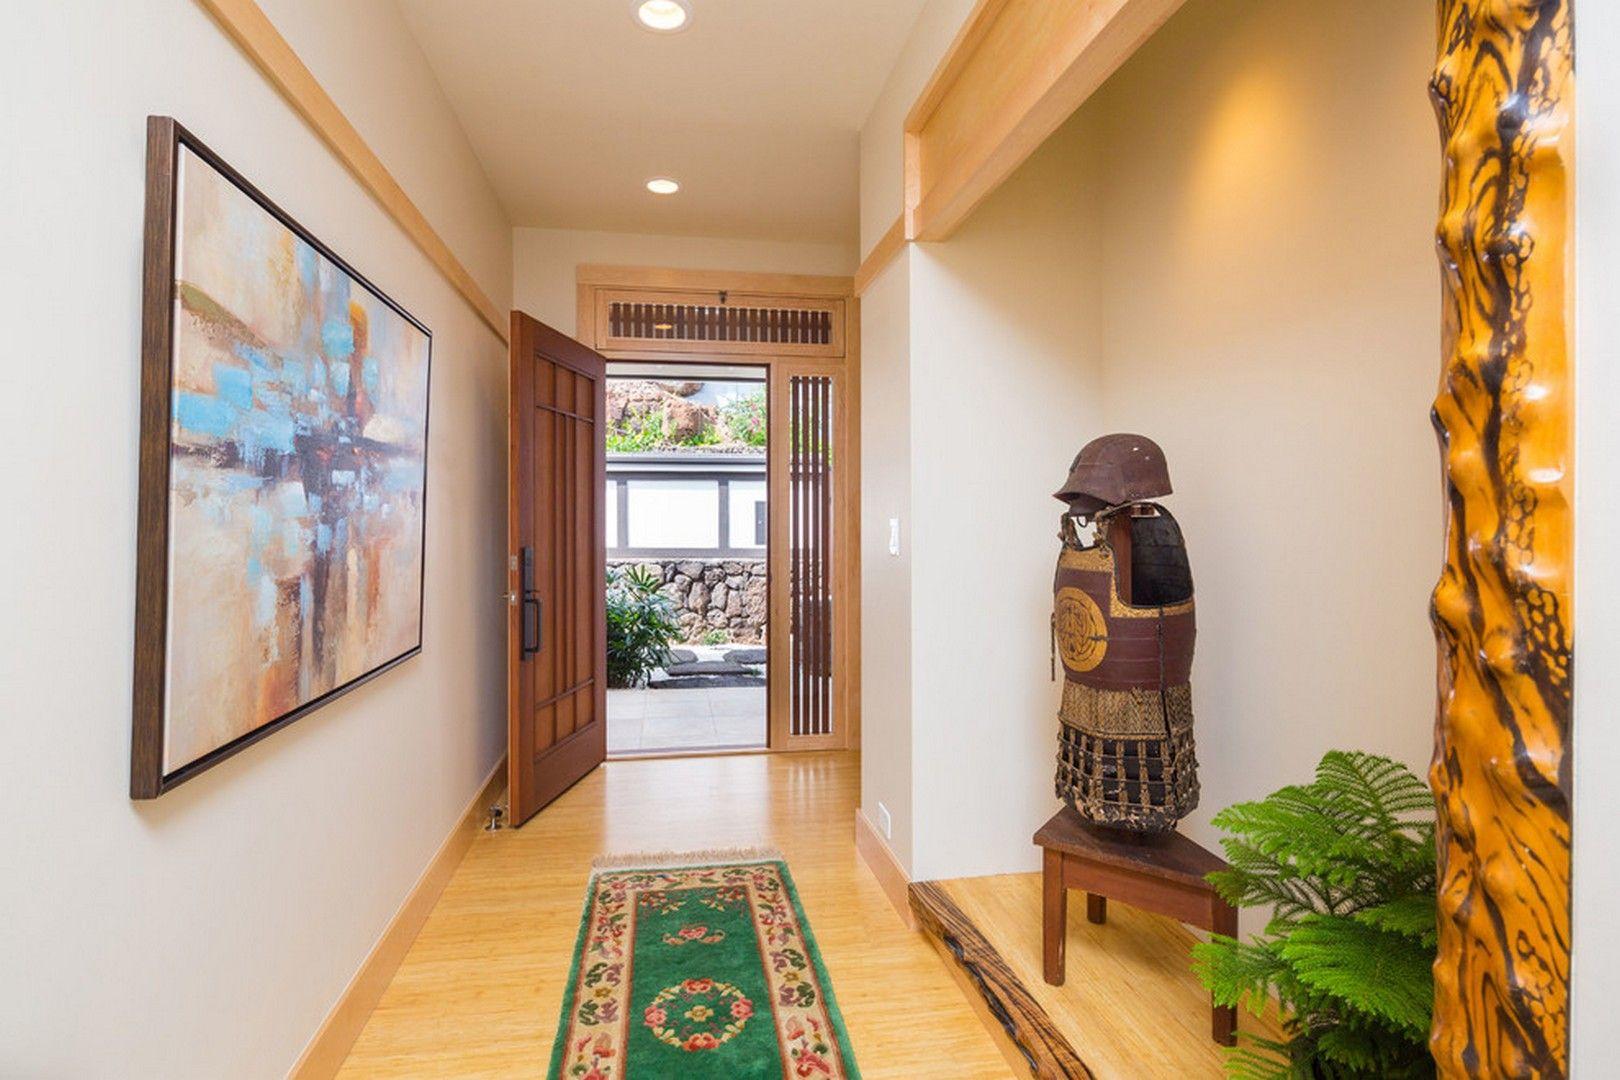 & 23 Japanese Inspired Room Design Make Your Living in Asian Styles